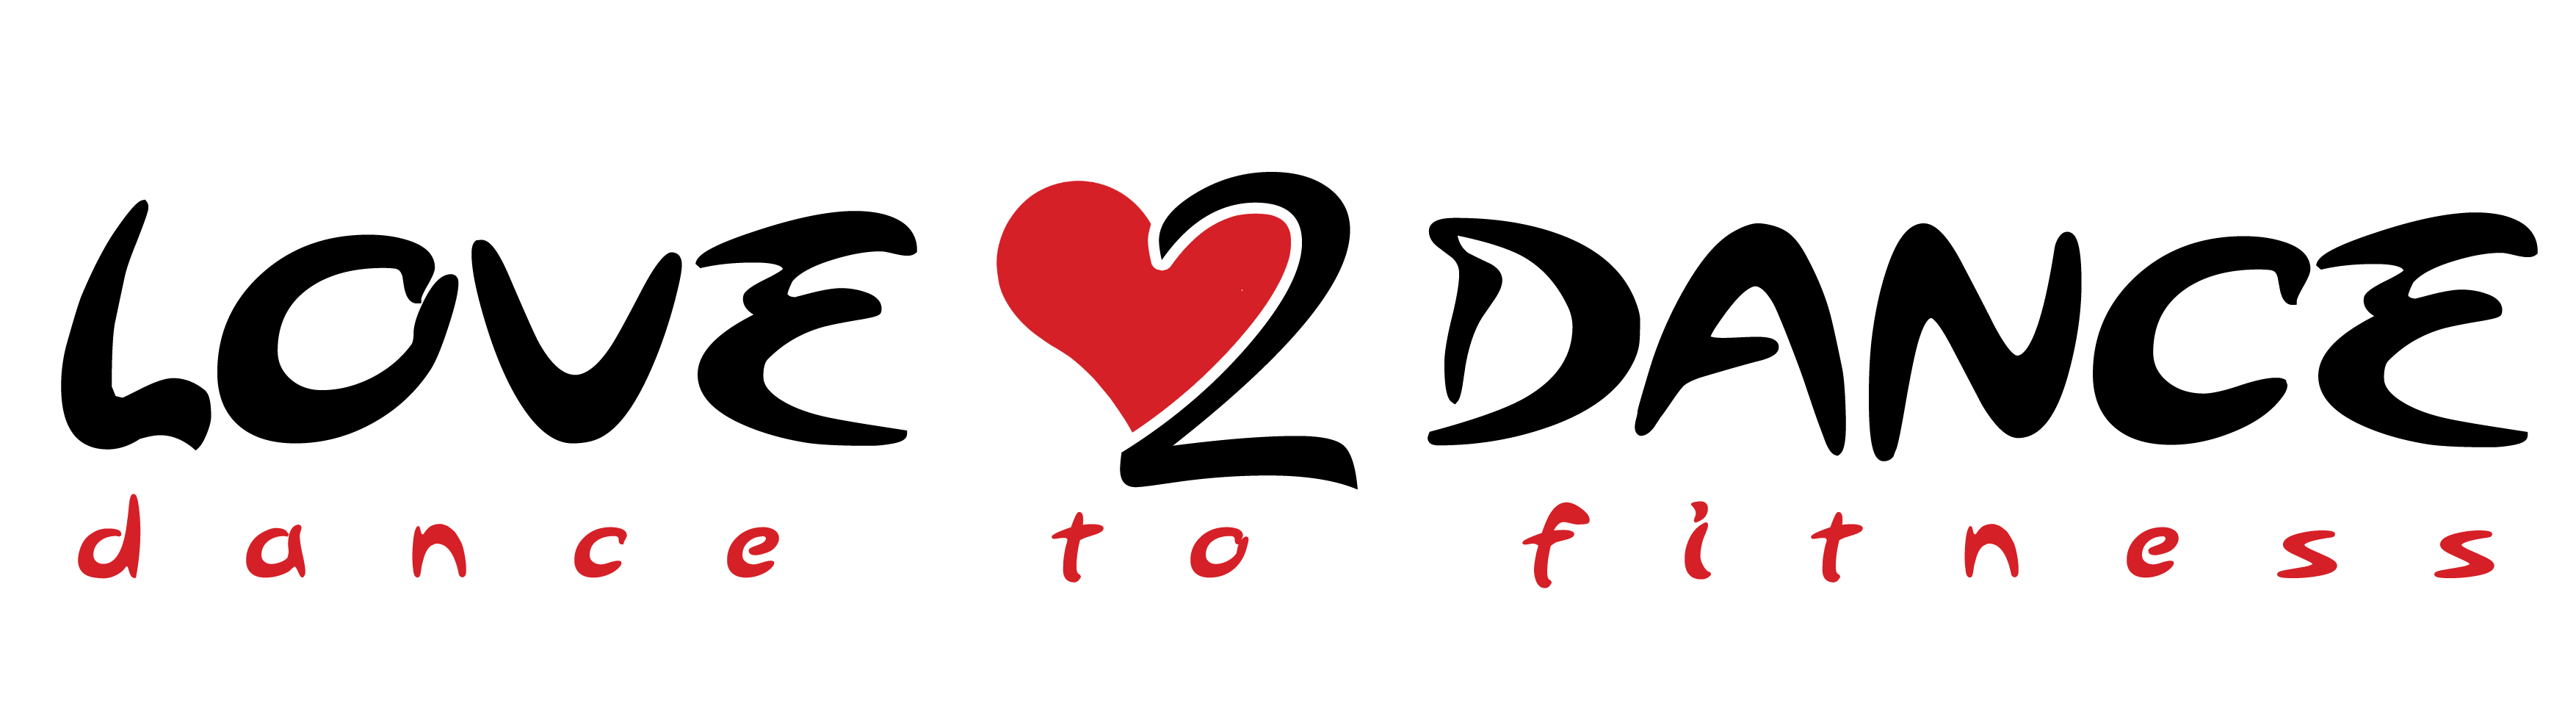 original-Logo-L2Dlogo